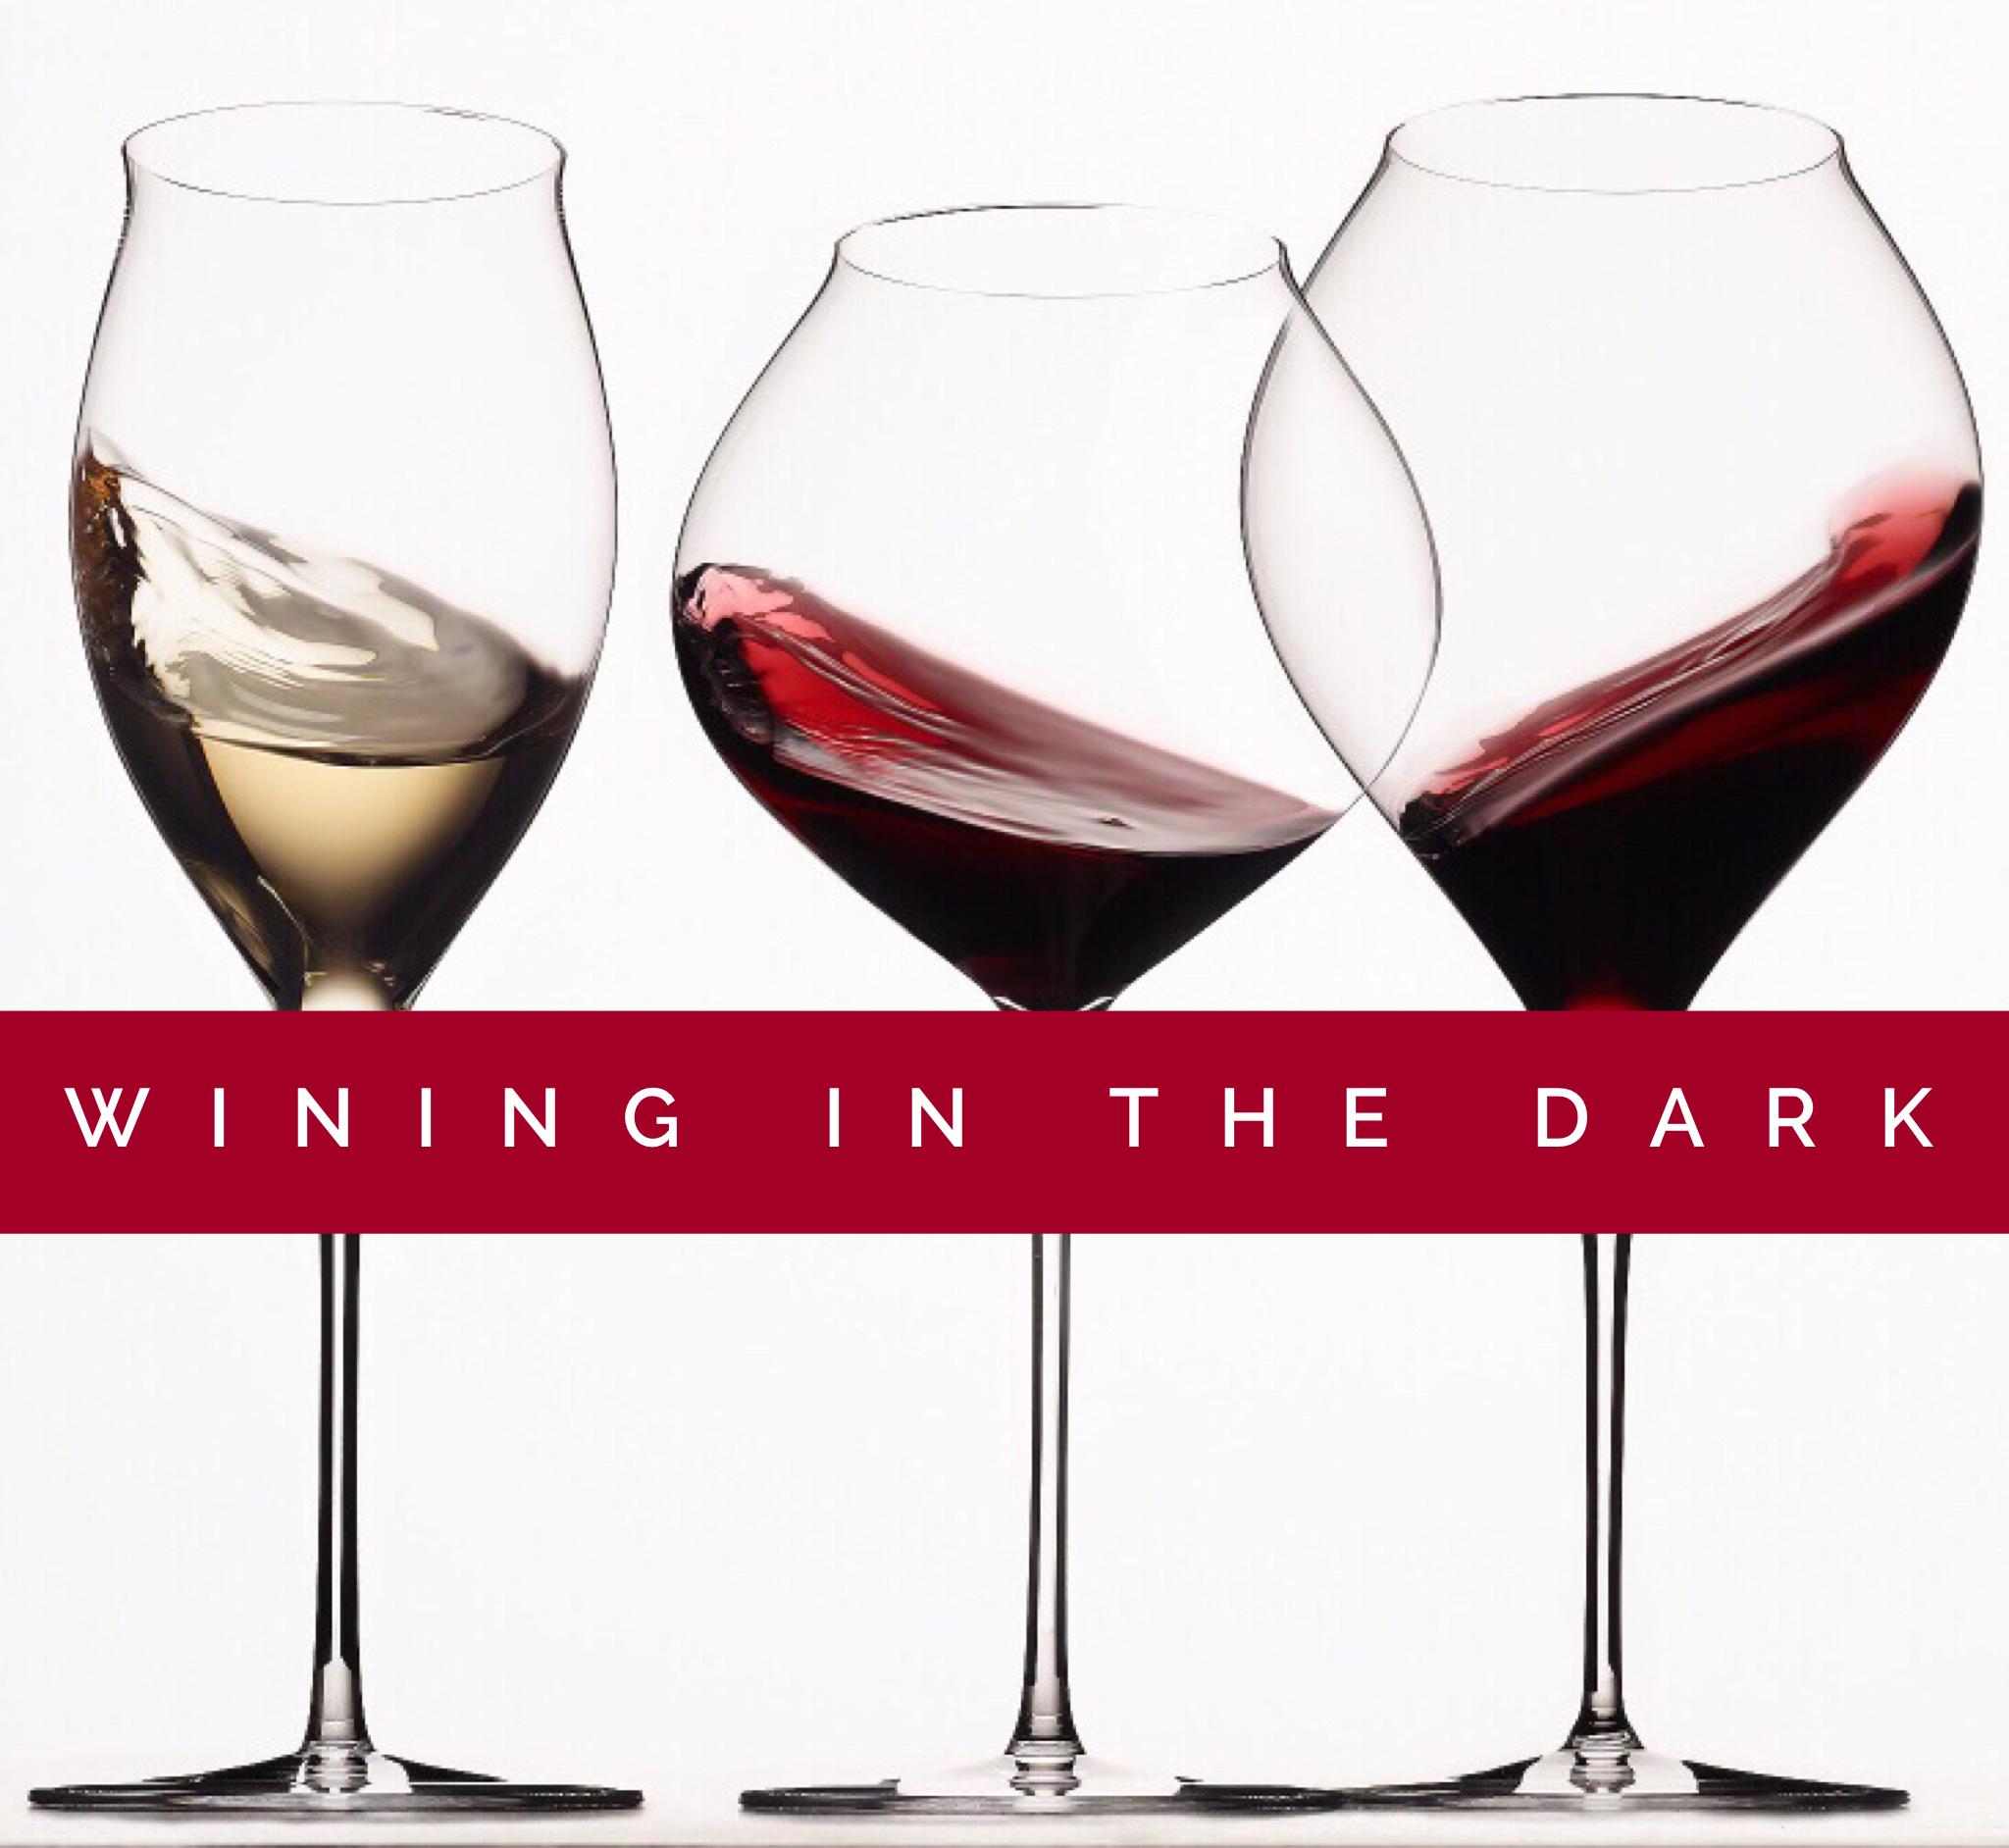 5th Annual Wining in the Dark!